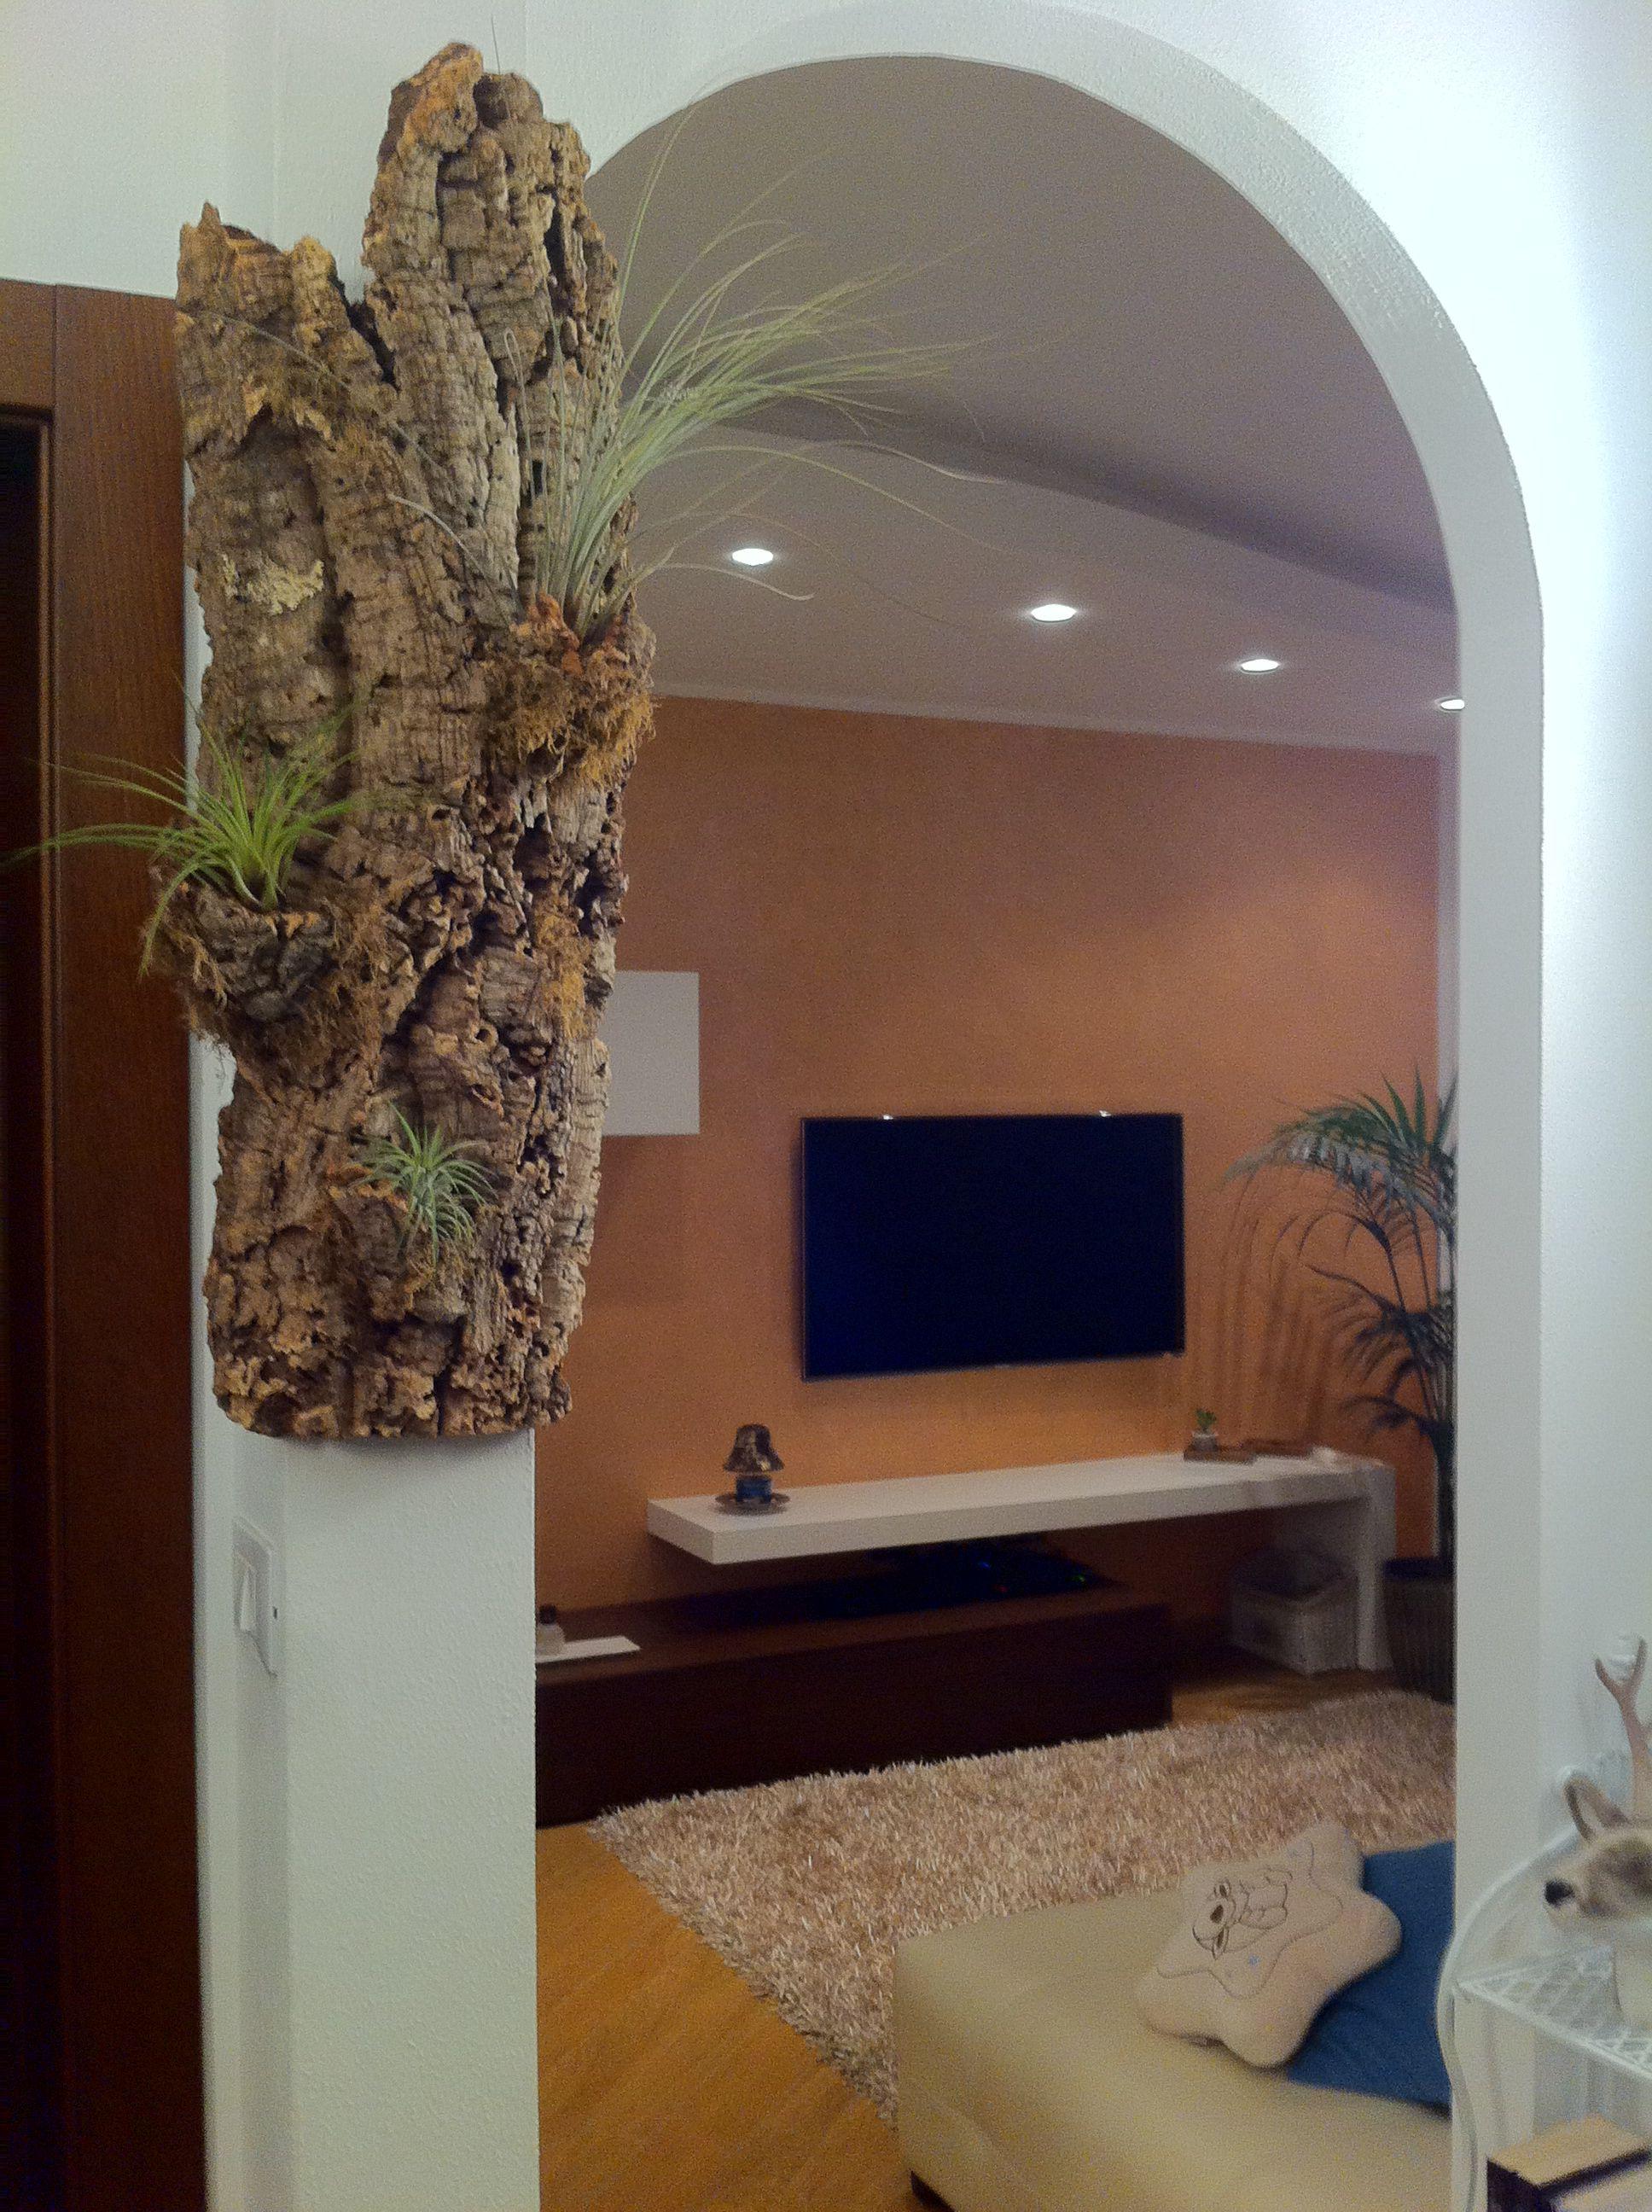 Home decor - Air plant - DIY